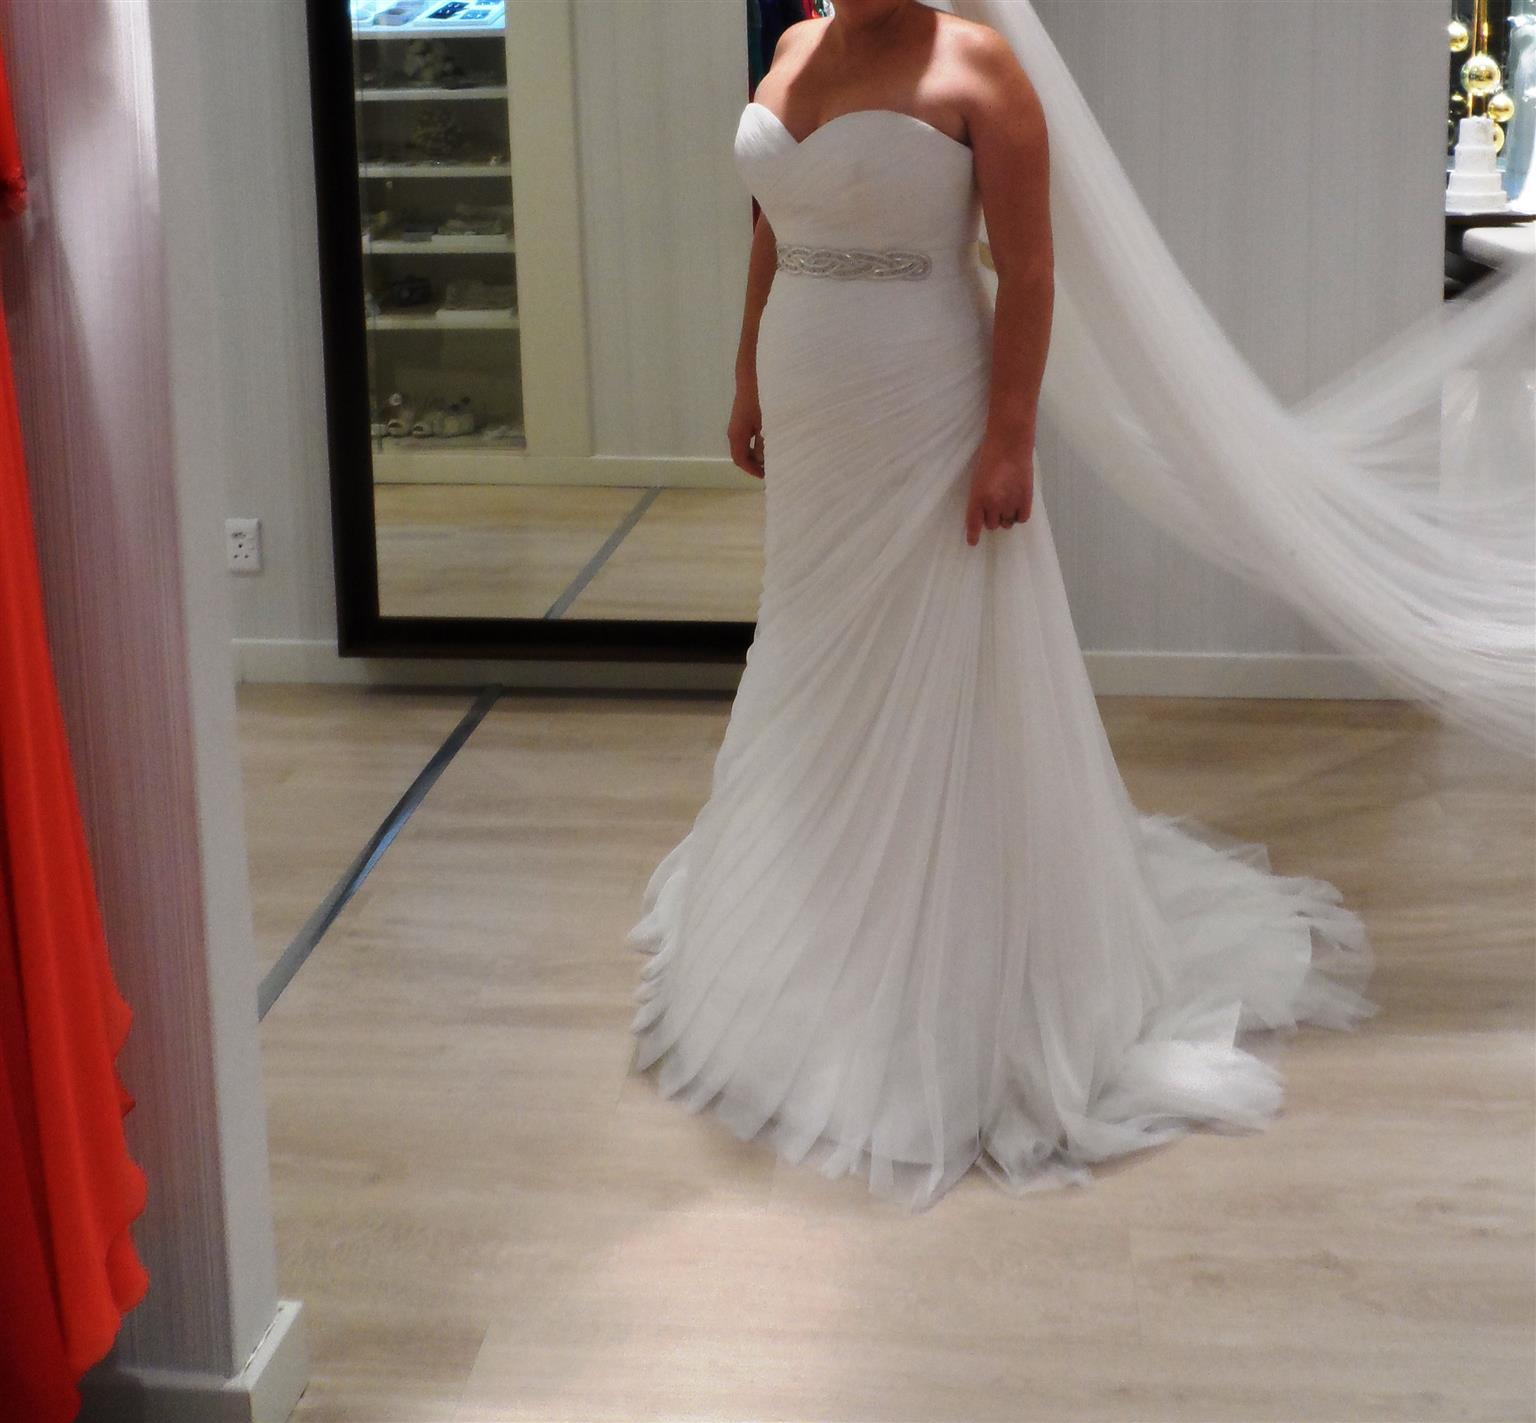 Beautiful Ivory mesh wedding dress - Pronovias Couture model. size 38-40